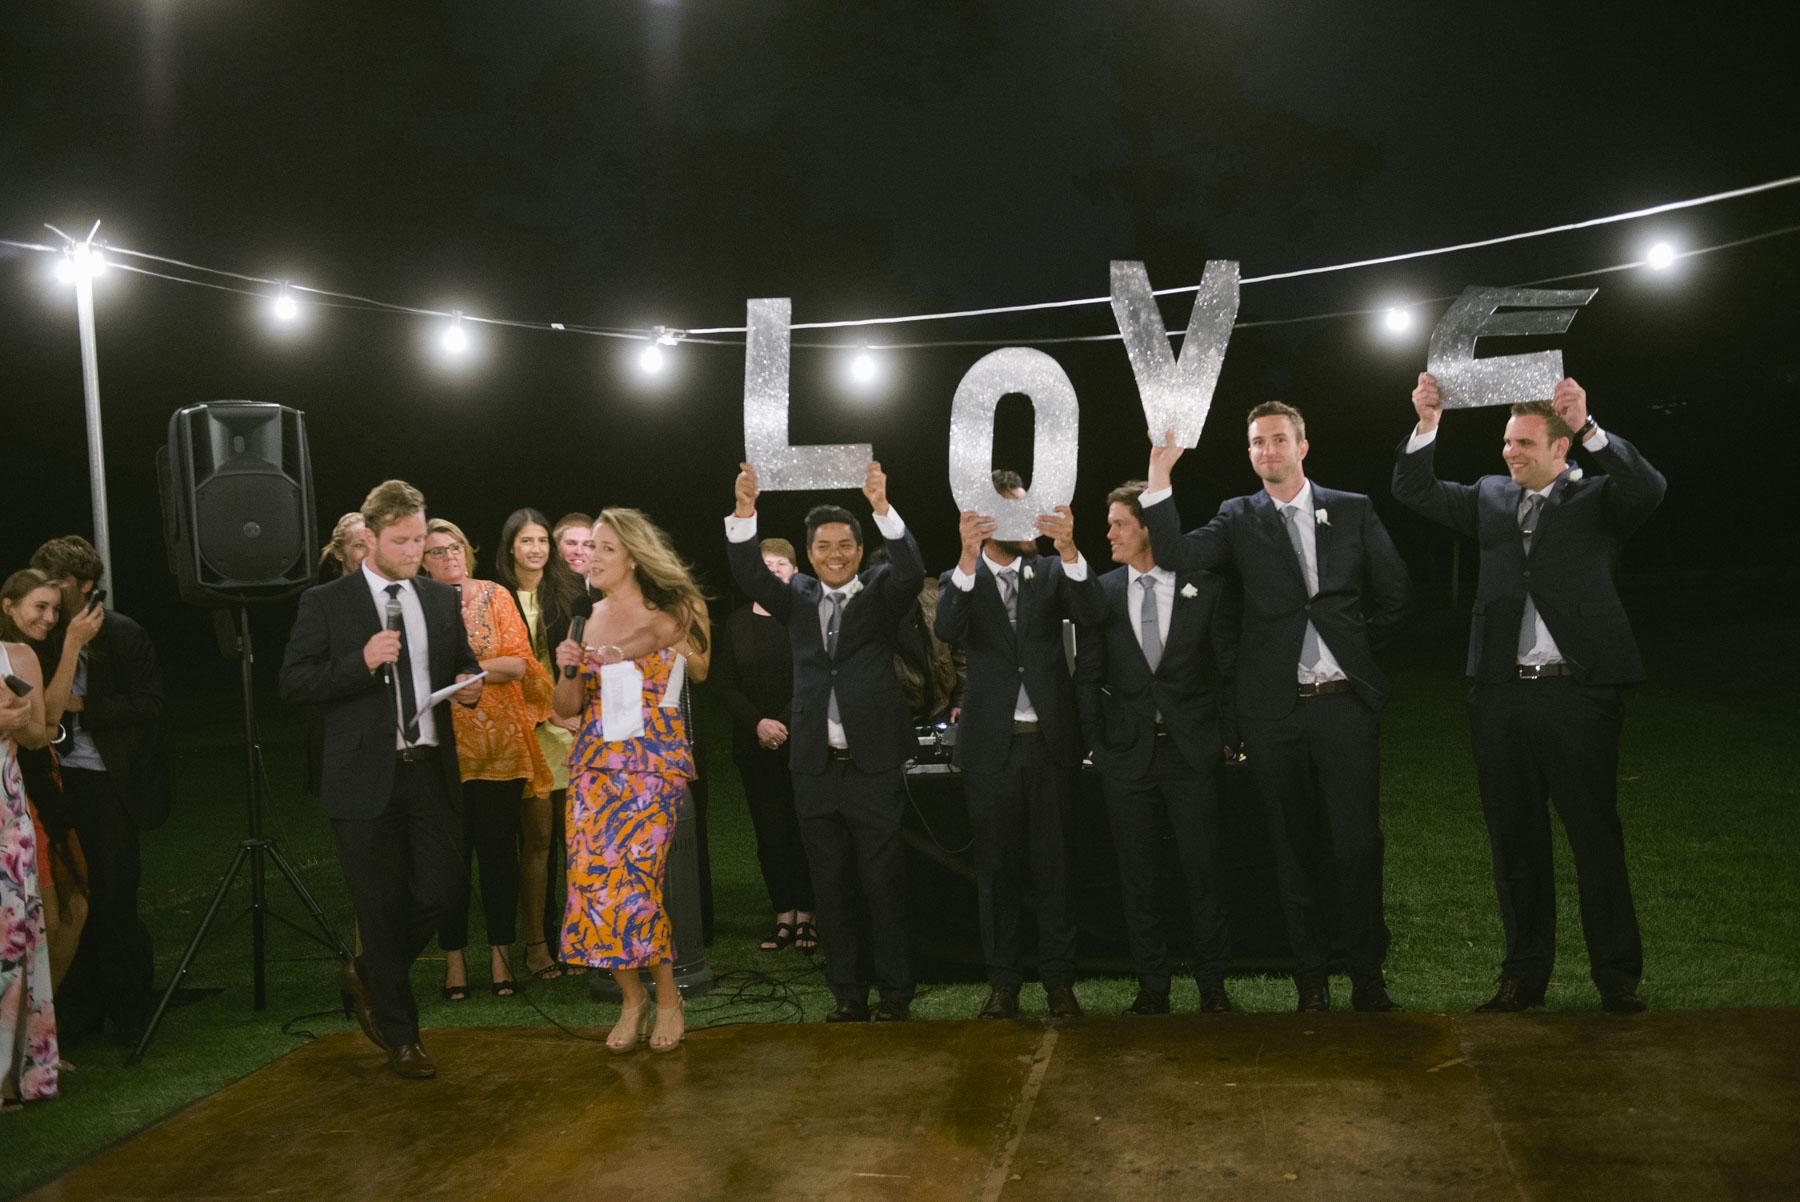 1501vand-435alan_moyle_wedding_portrait_brighton_bayside_werribee_estate_mansion_zoo_rustic_styled_garden_mansion_candid_documentry_victoria_whitelaw.jpg